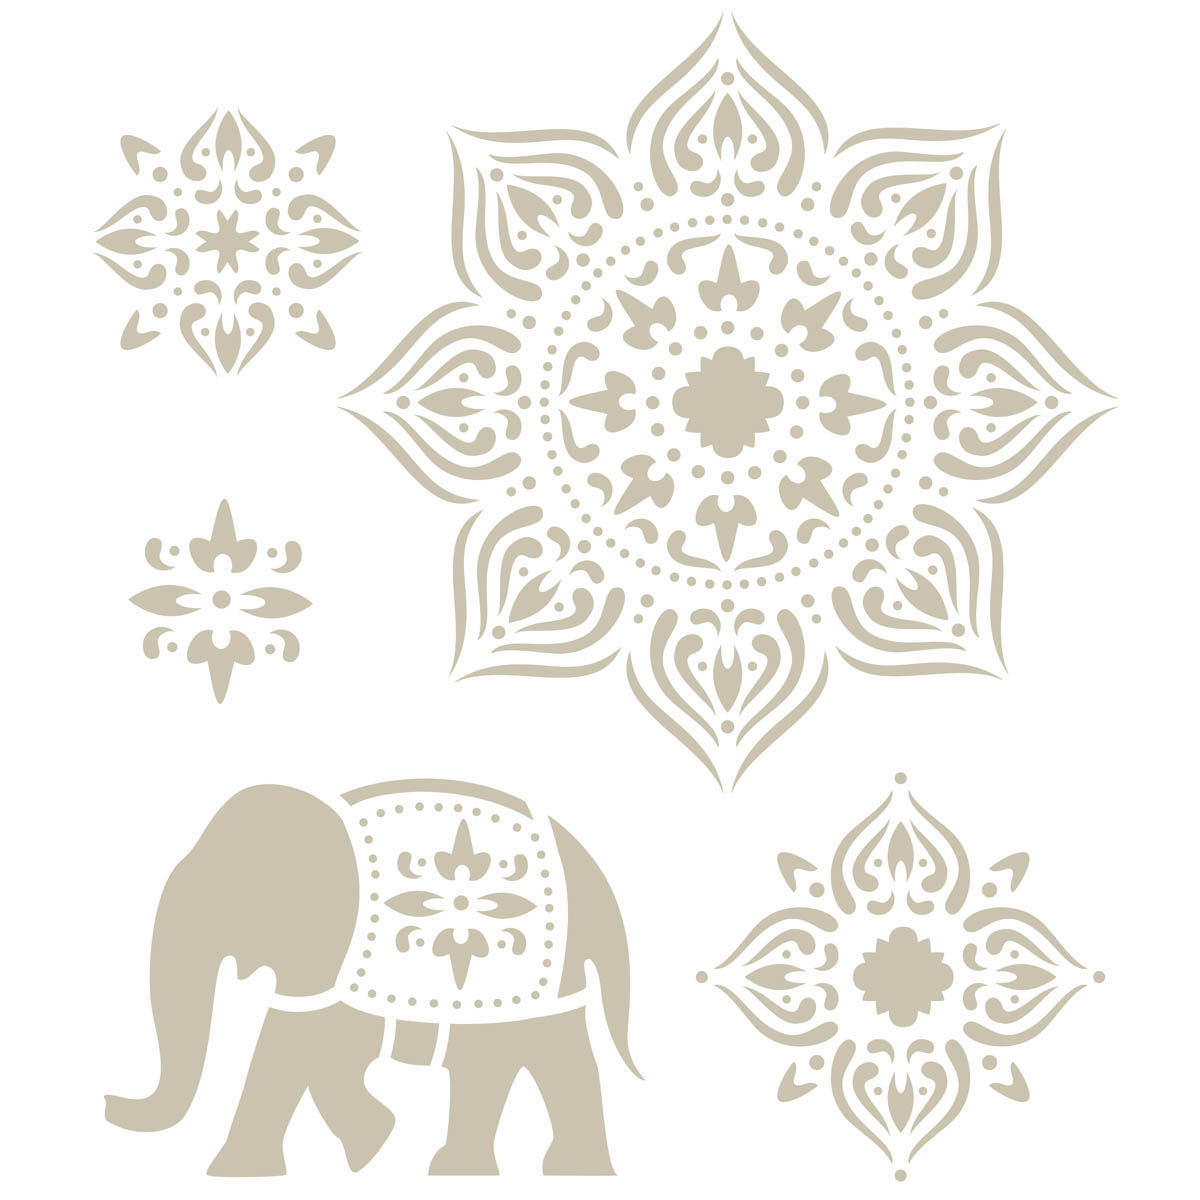 FolkArt ® Handmade Charlotte™ Stencils - Tangier - 30950